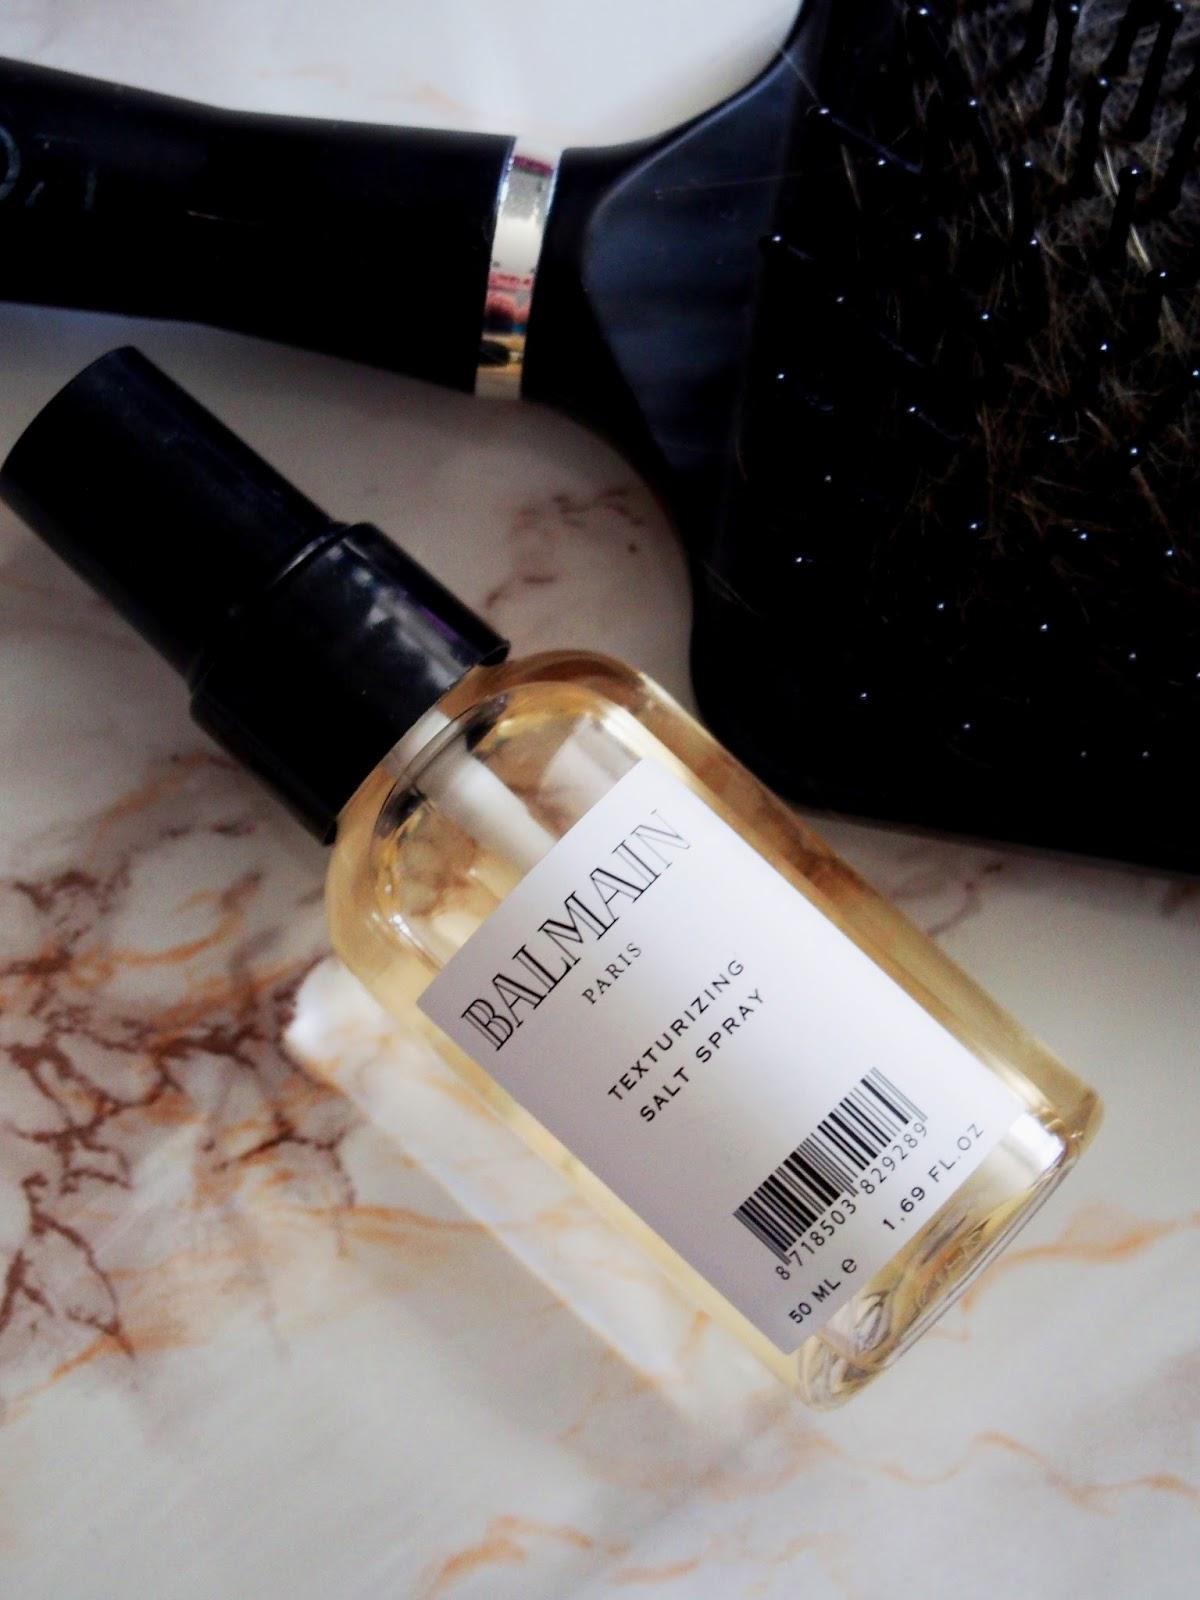 Balmain salt sparay suola suihke tuuheuttava harja brush hius hair